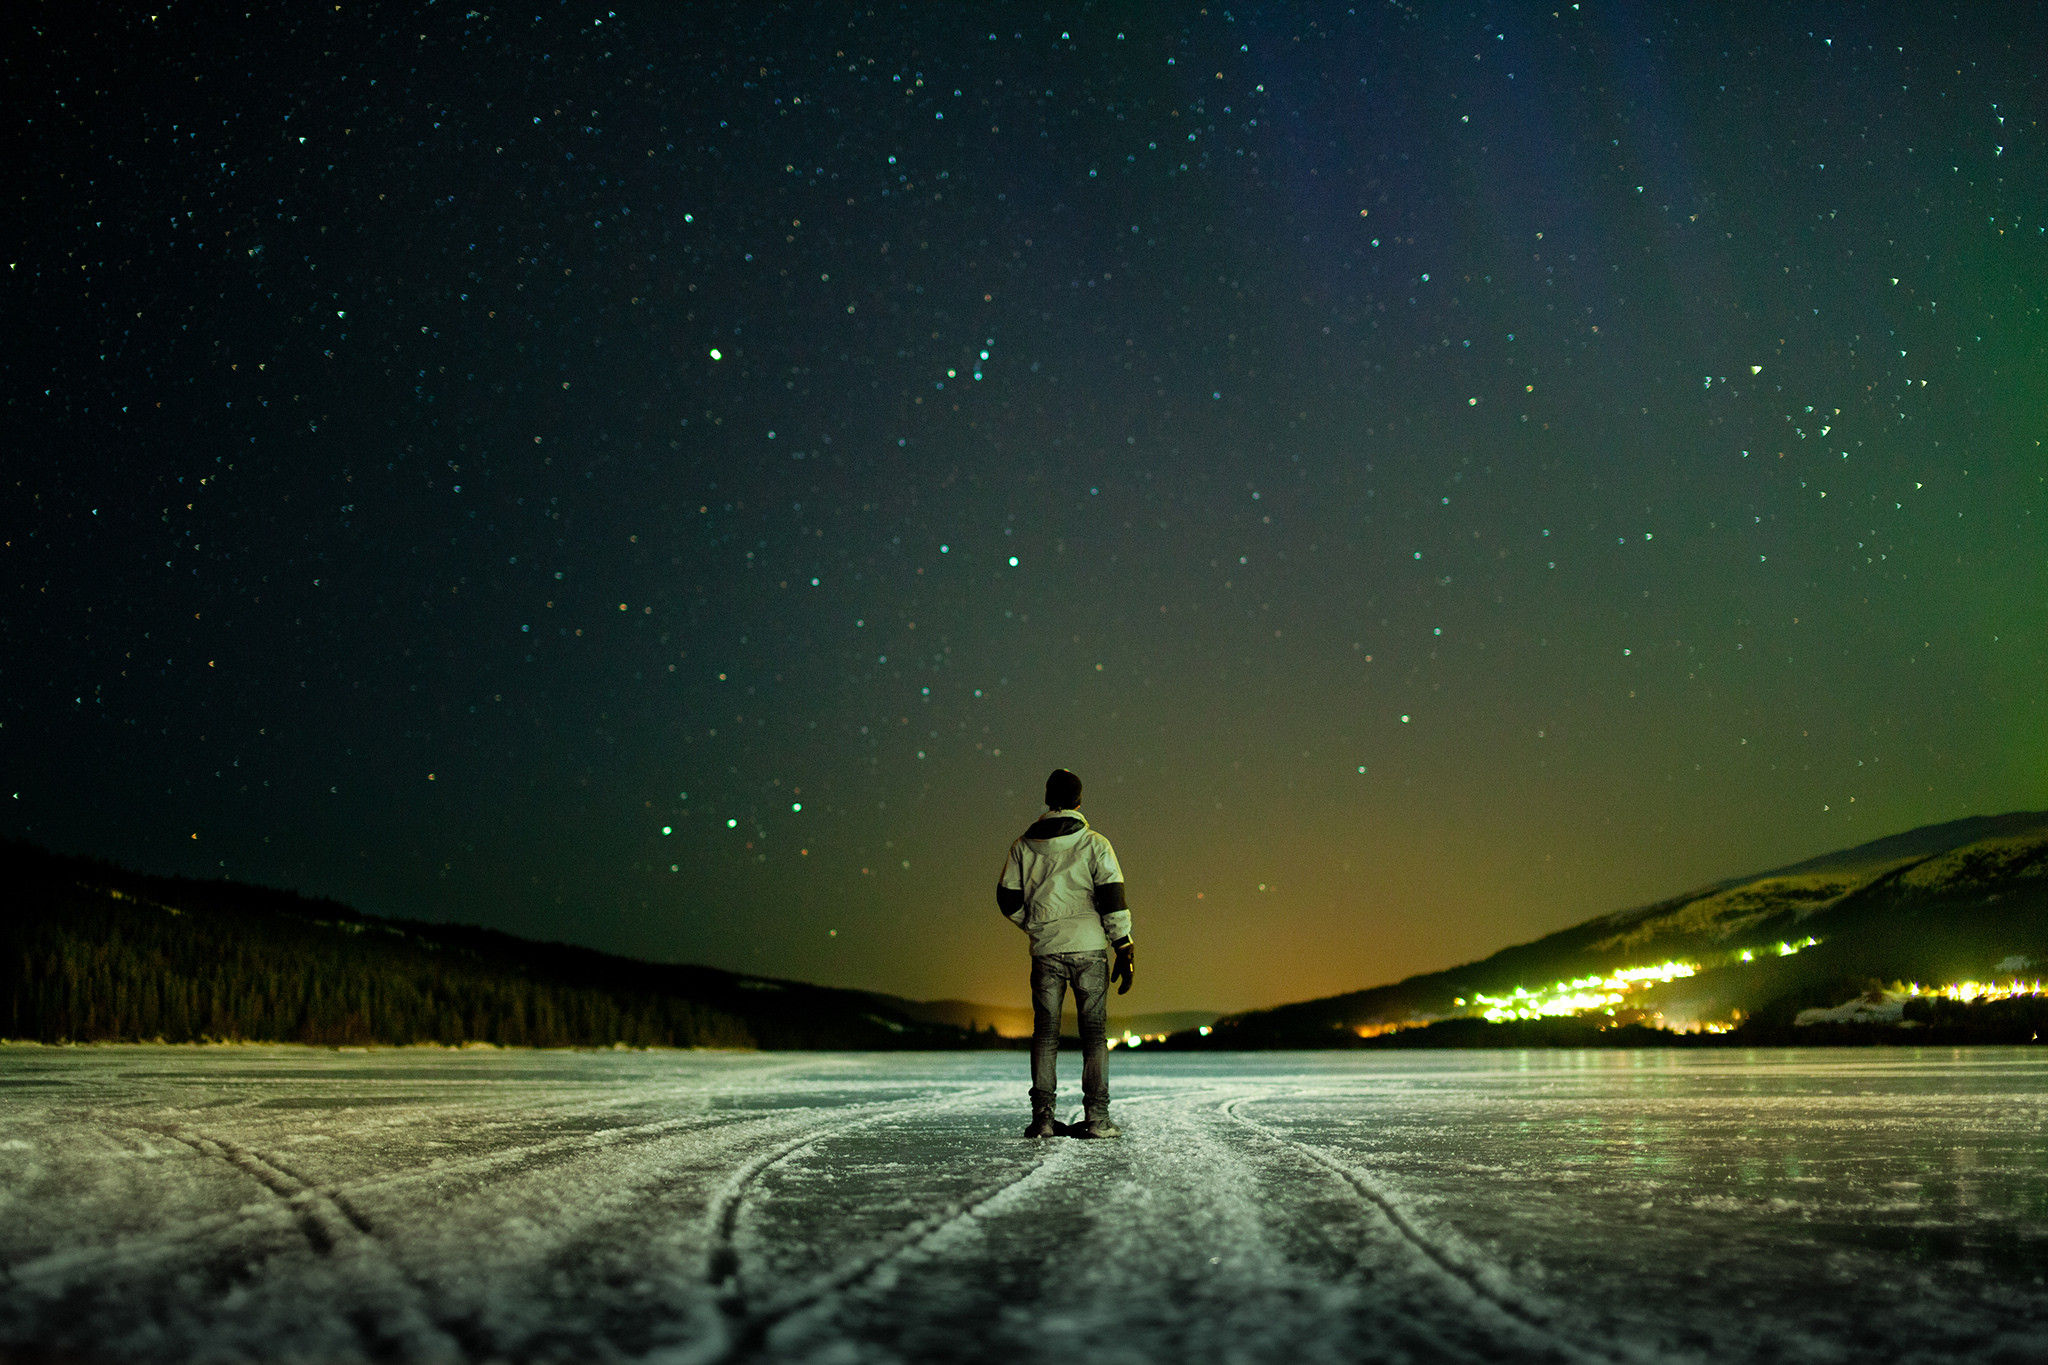 … night, winter, sky, stars, river ice, the horizon, the lights